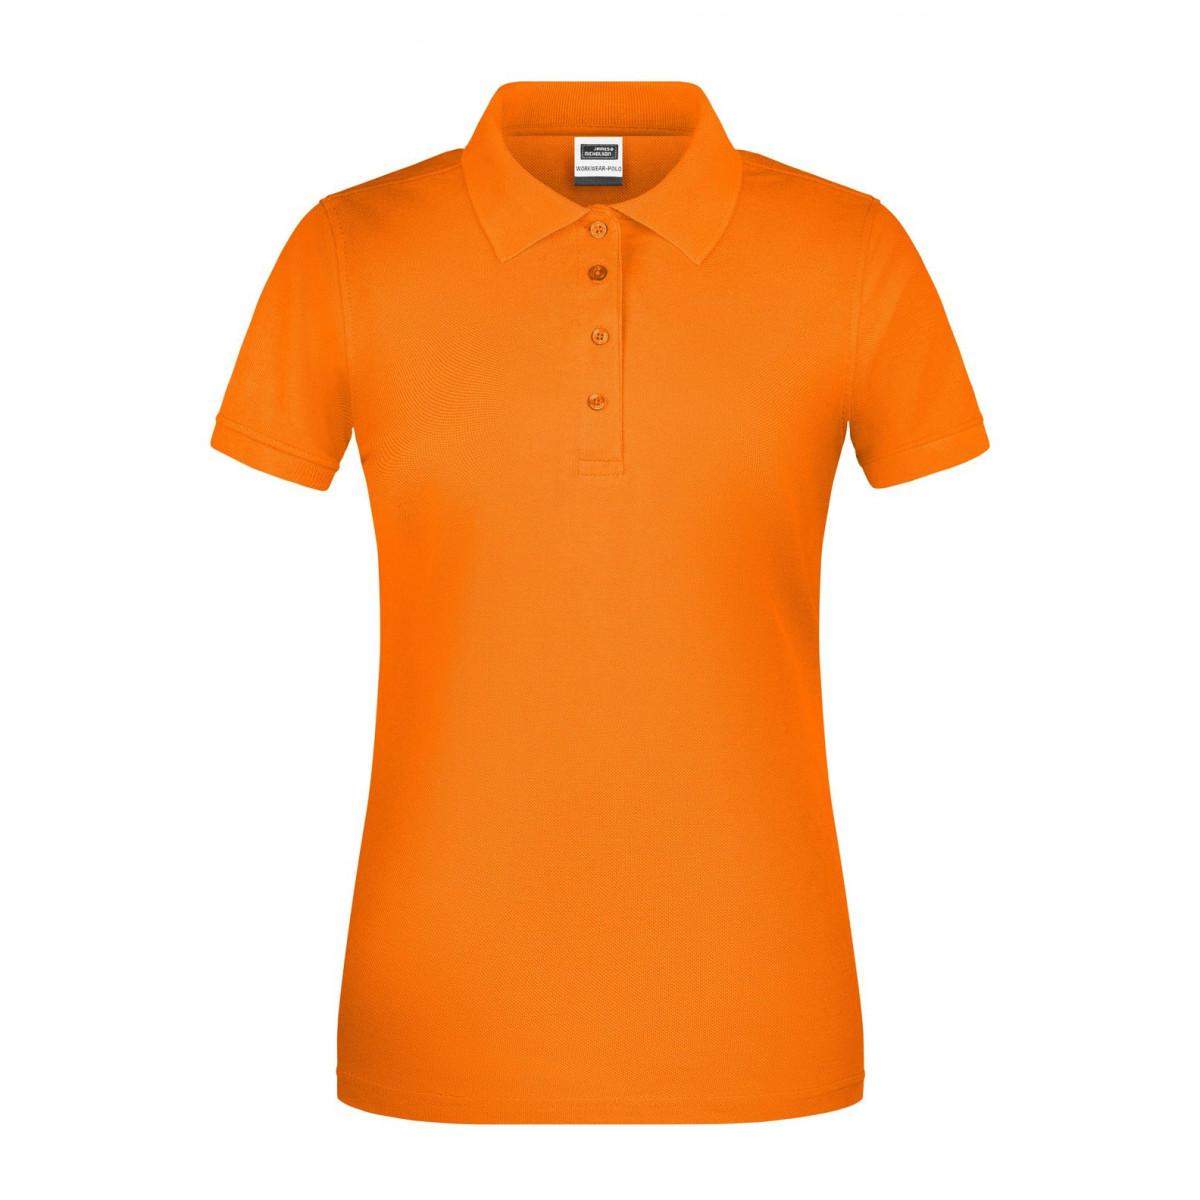 Рубашка поло женская JN873 Ladies BIO Workwear Polo - Оранжевый